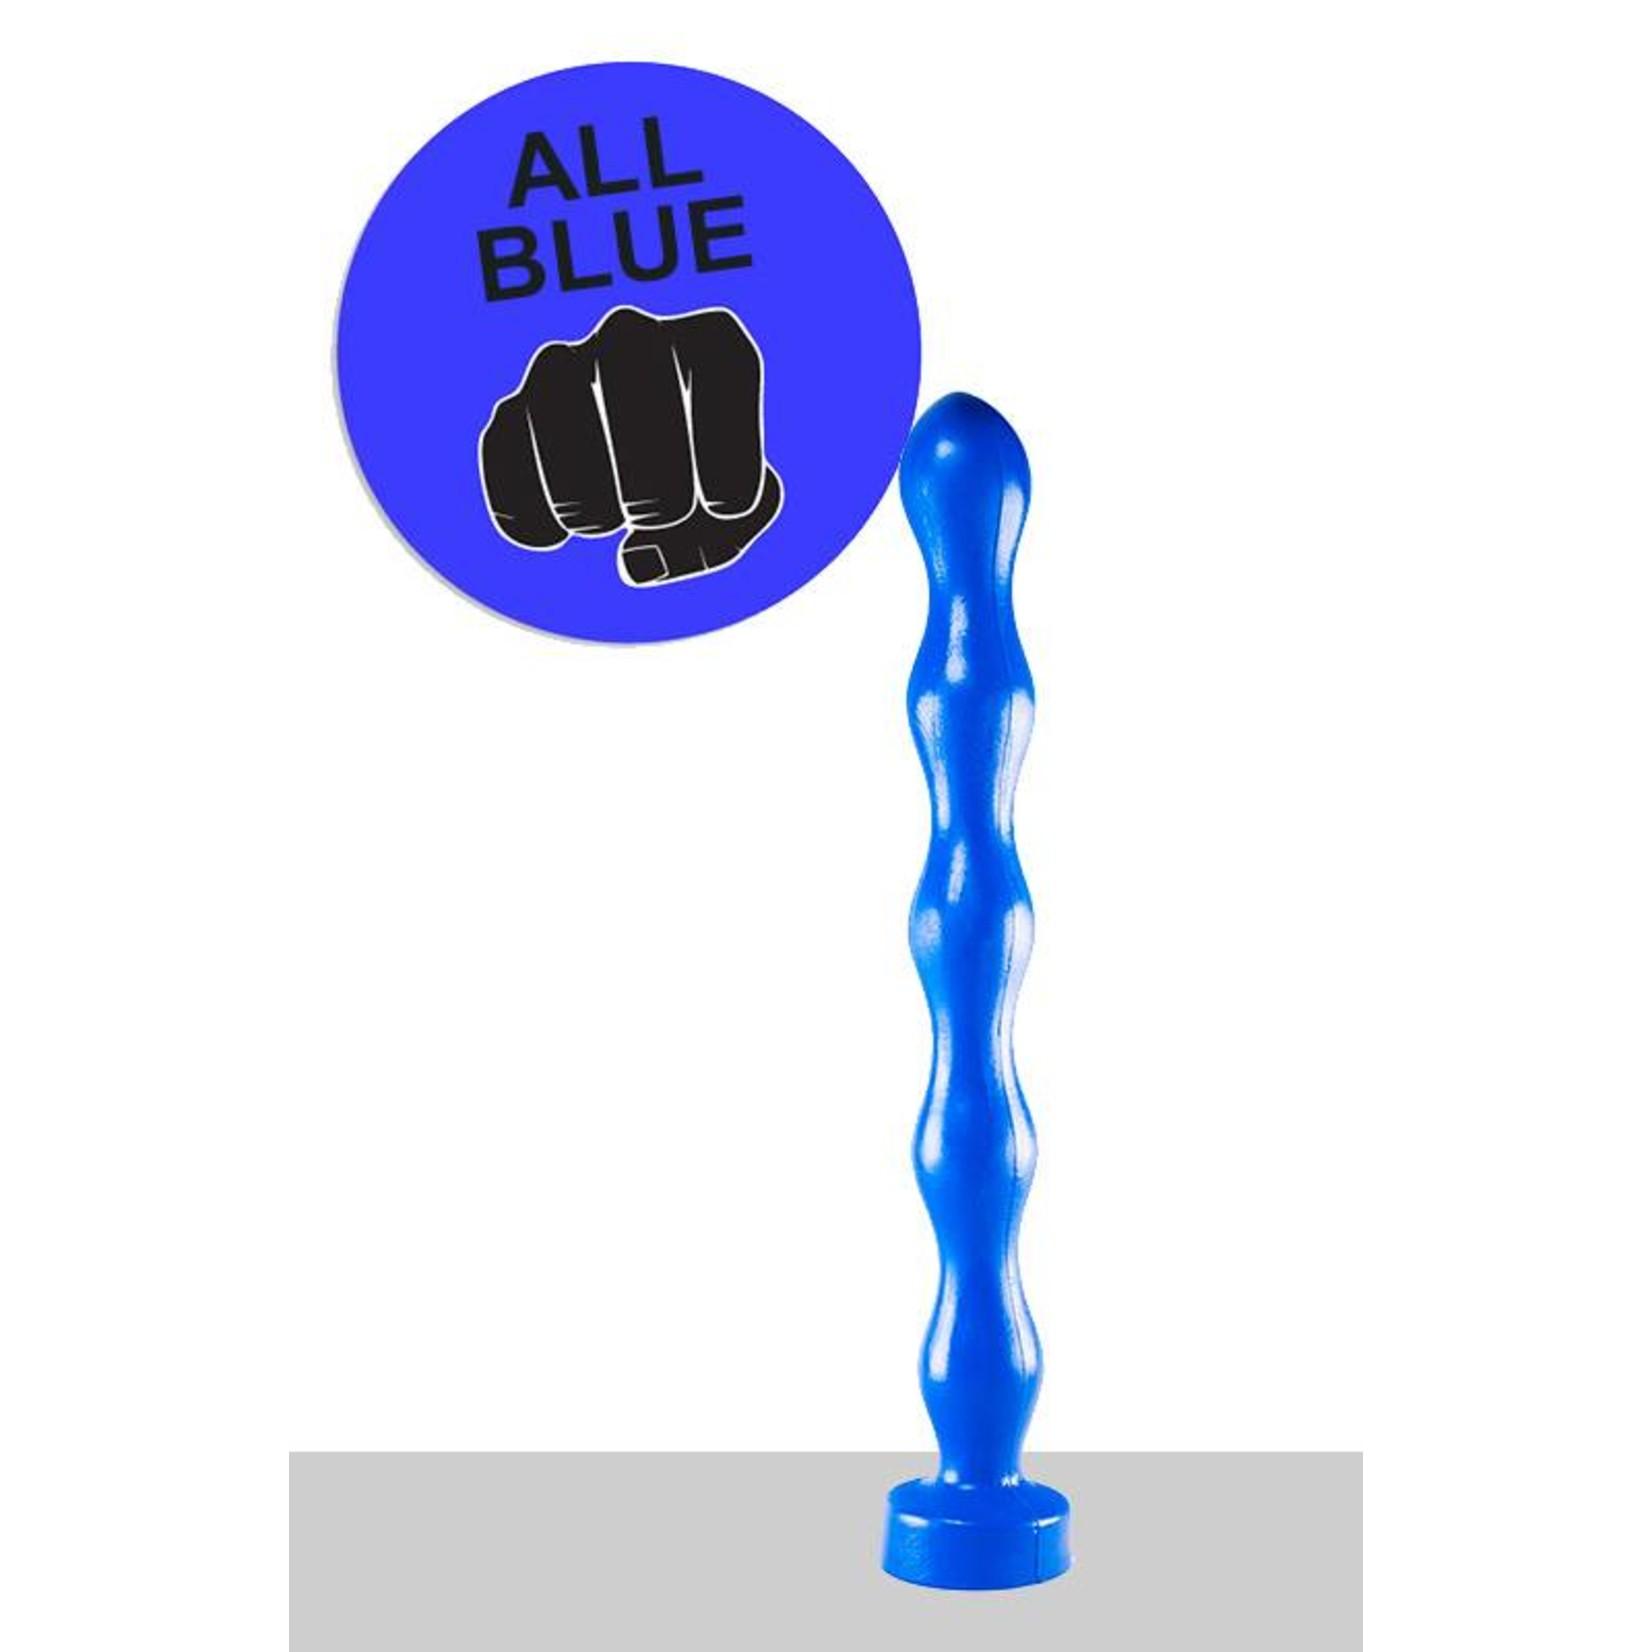 All Black All Blue Dildo - ABB 69